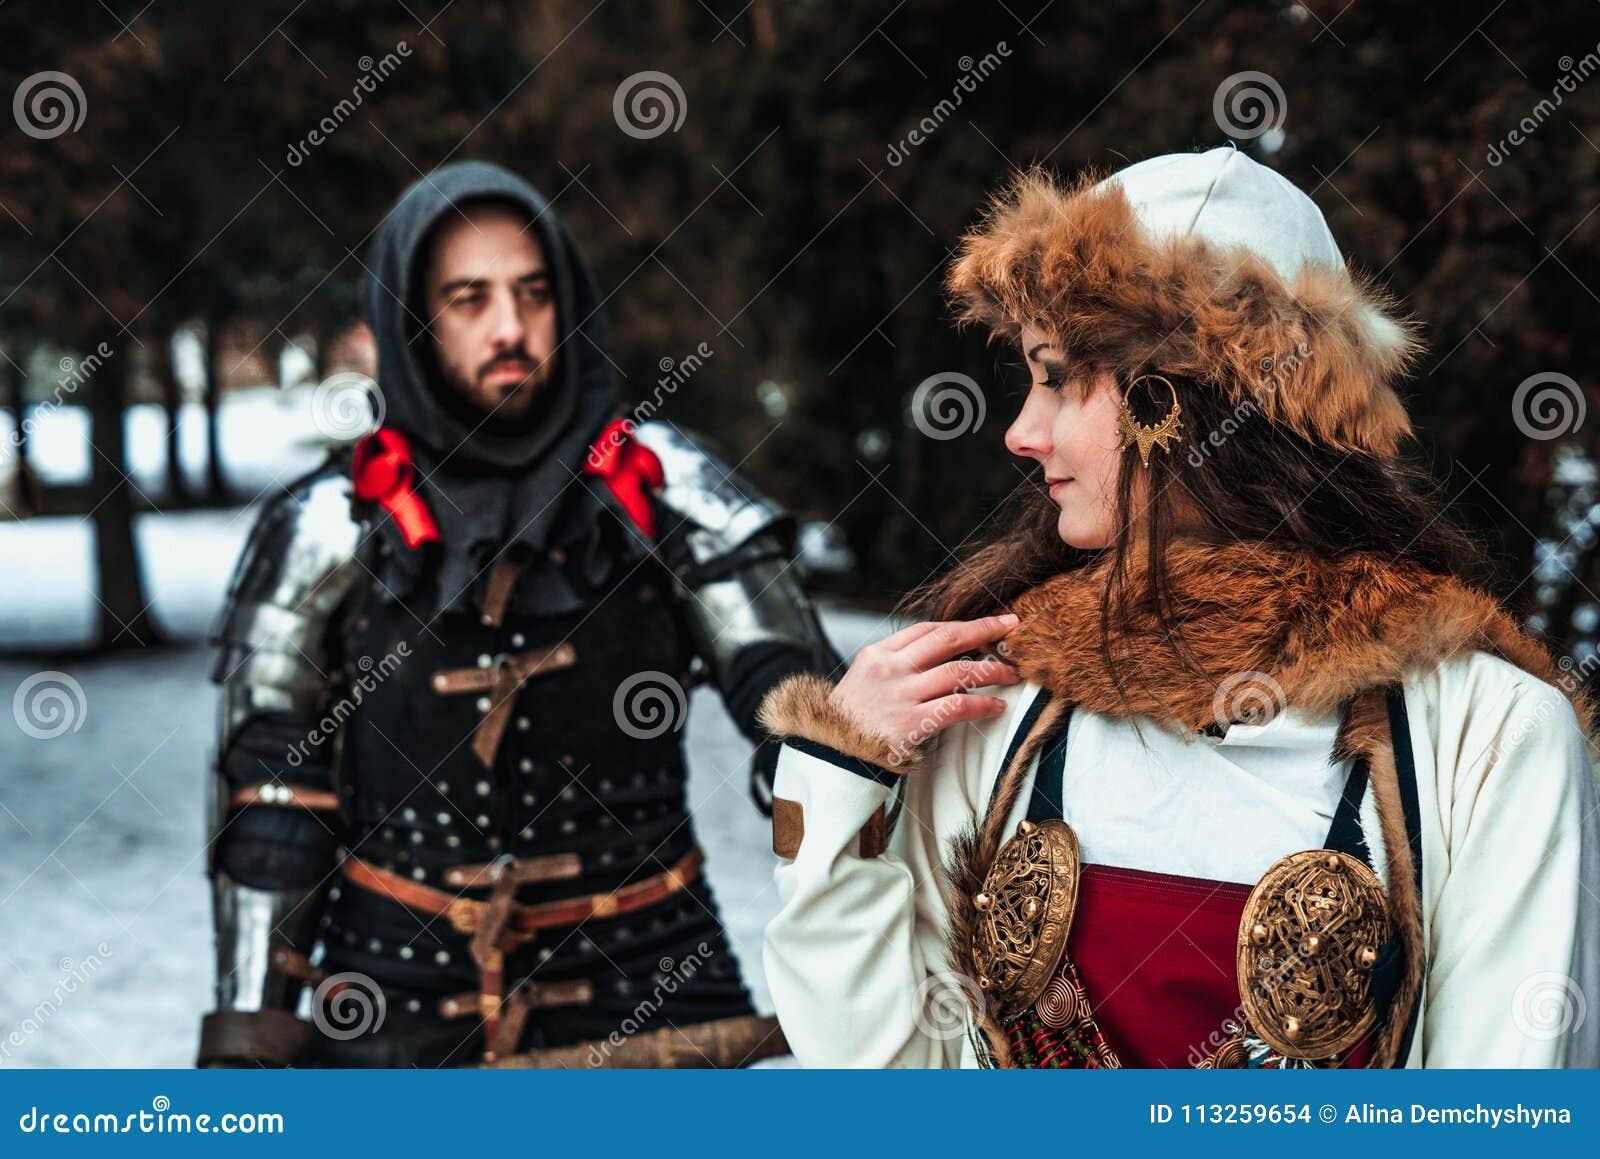 woman knight armor